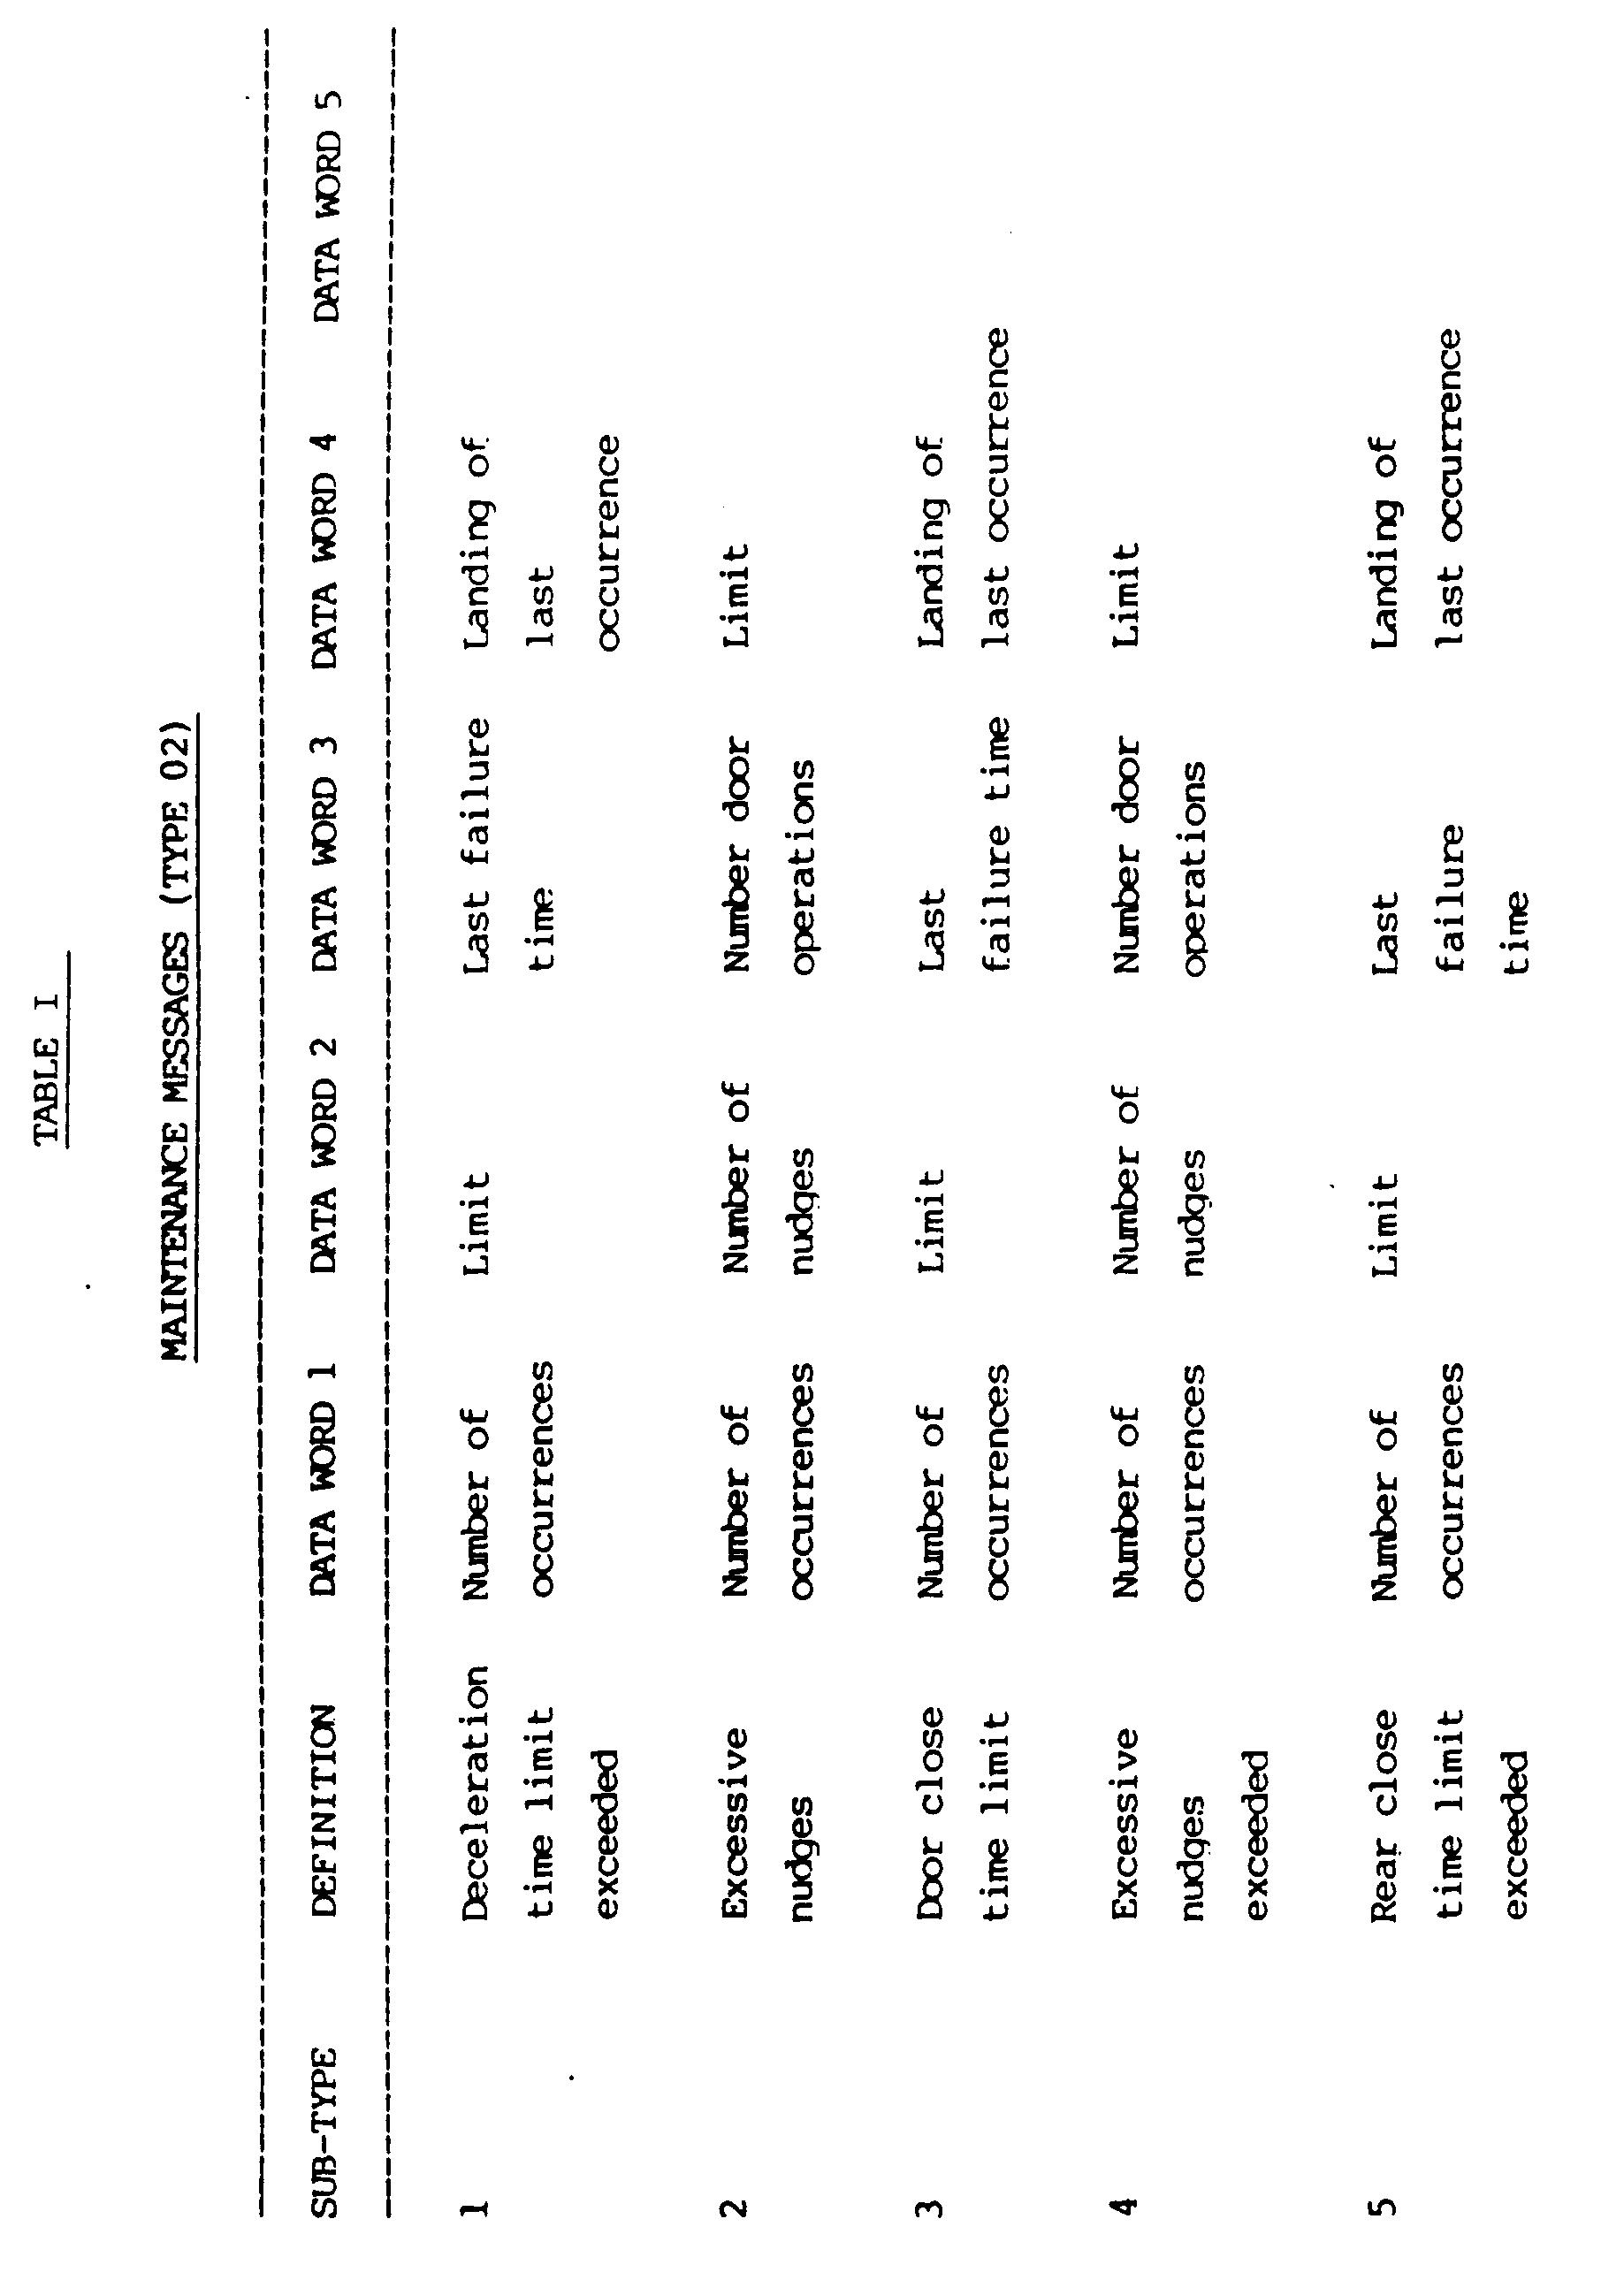 Ep0367388b1 Elevator Diagnostic Monitoring Apparatus Google Patents Ladder Logic Diagram For Figure Imgb0004